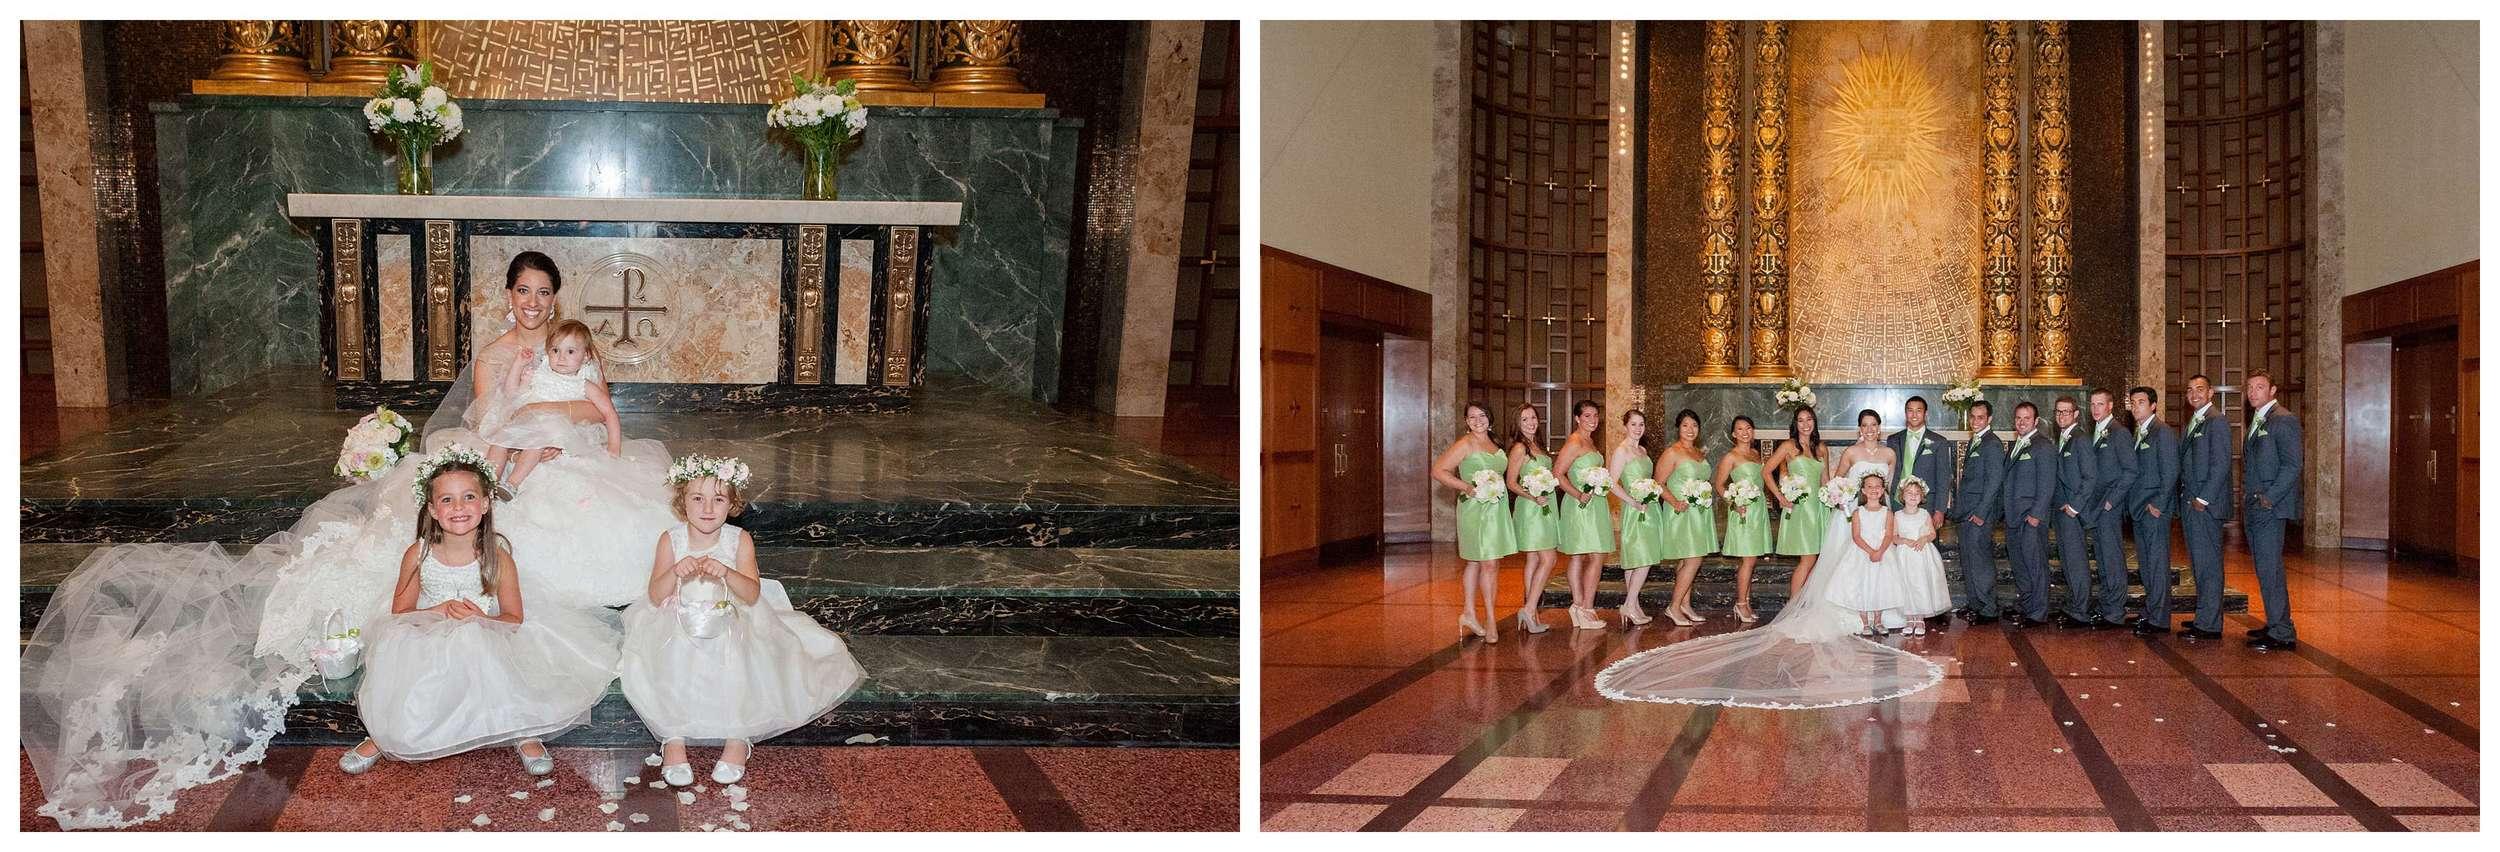 B-Jones-Photography-Seattle-Wedding-Photographer_0865.jpg